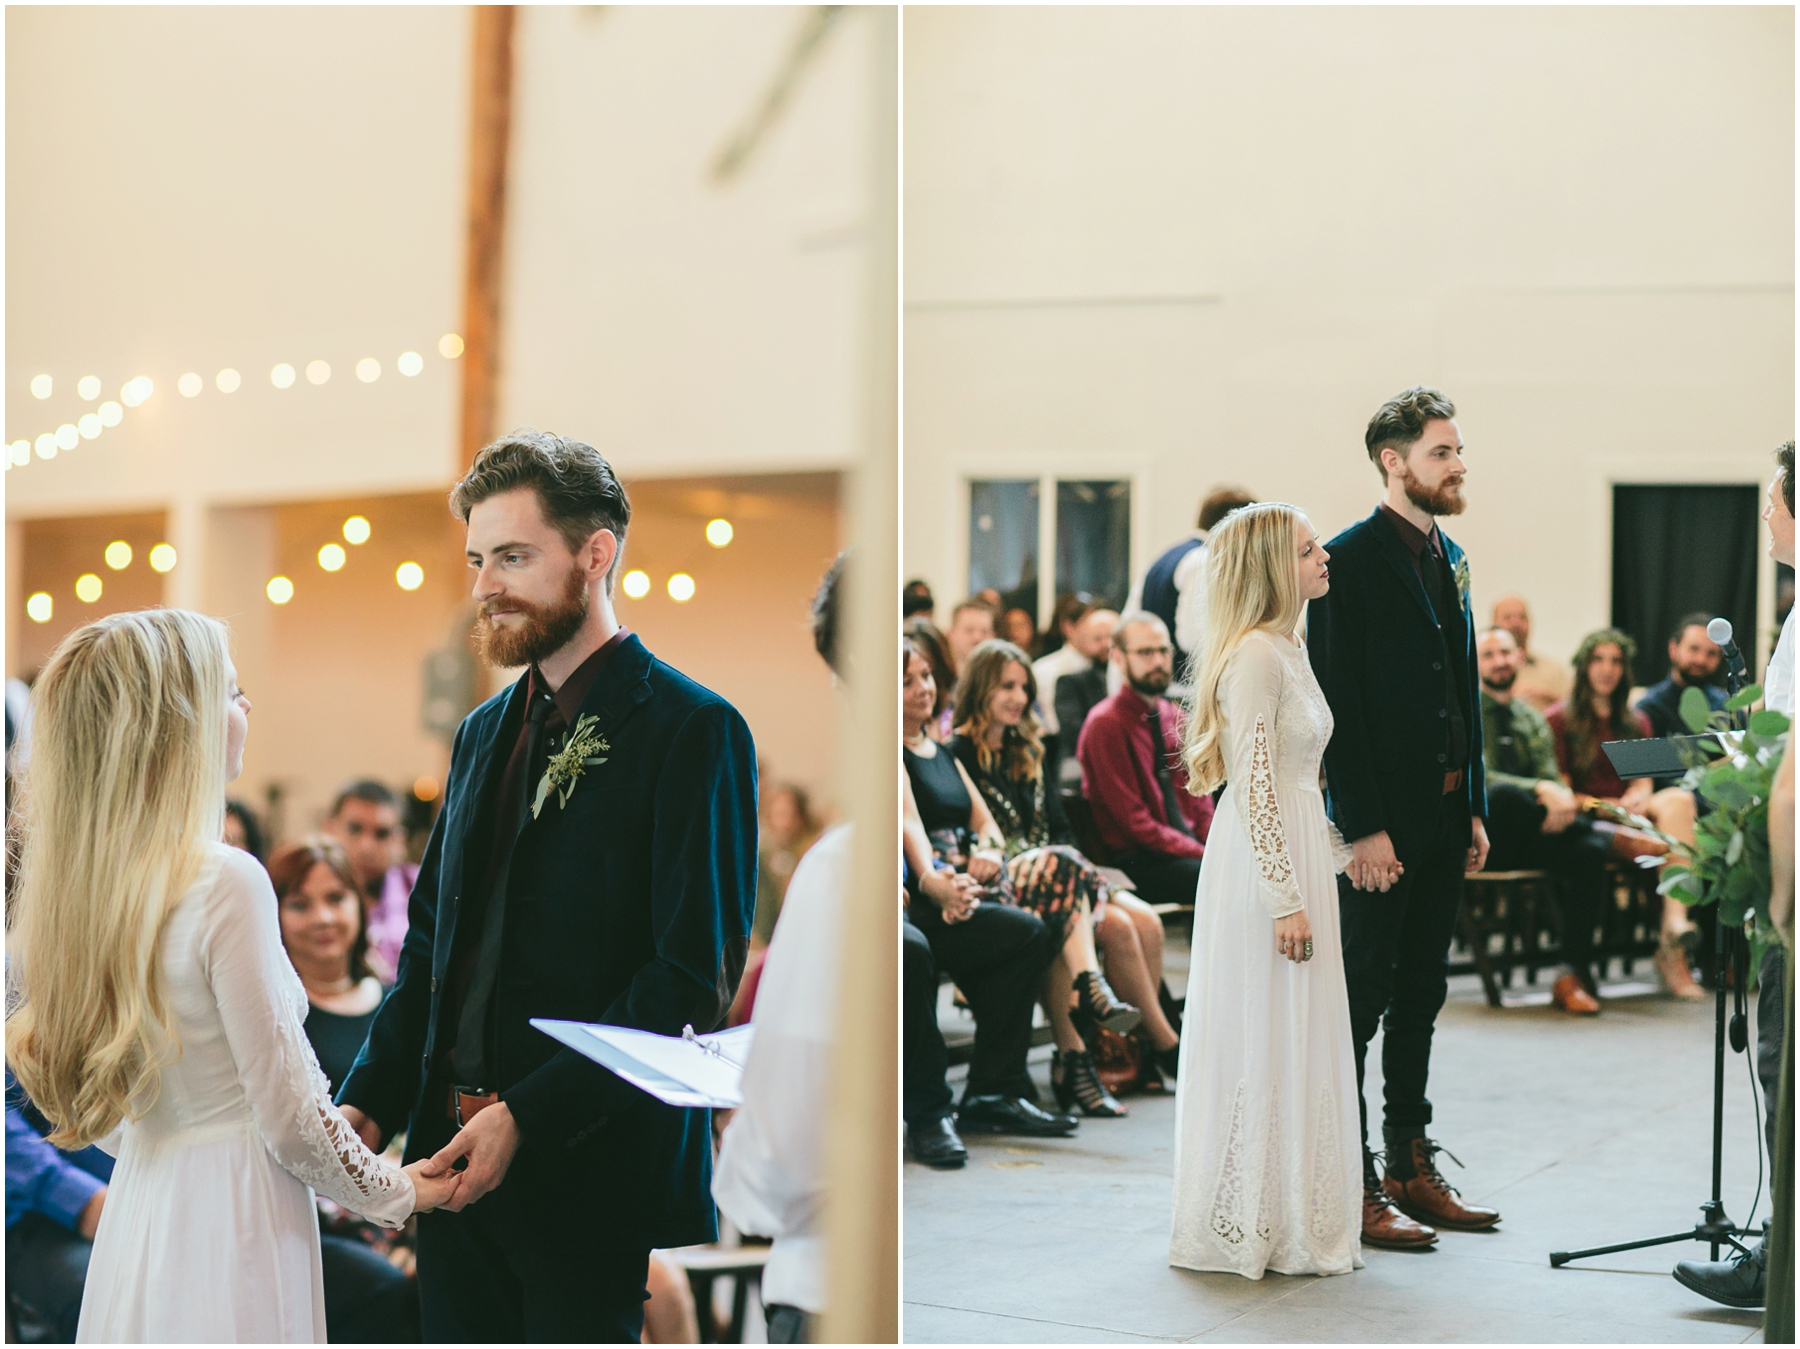 Natalie+Corey-WEDDING_KELLYBOITANO_0094